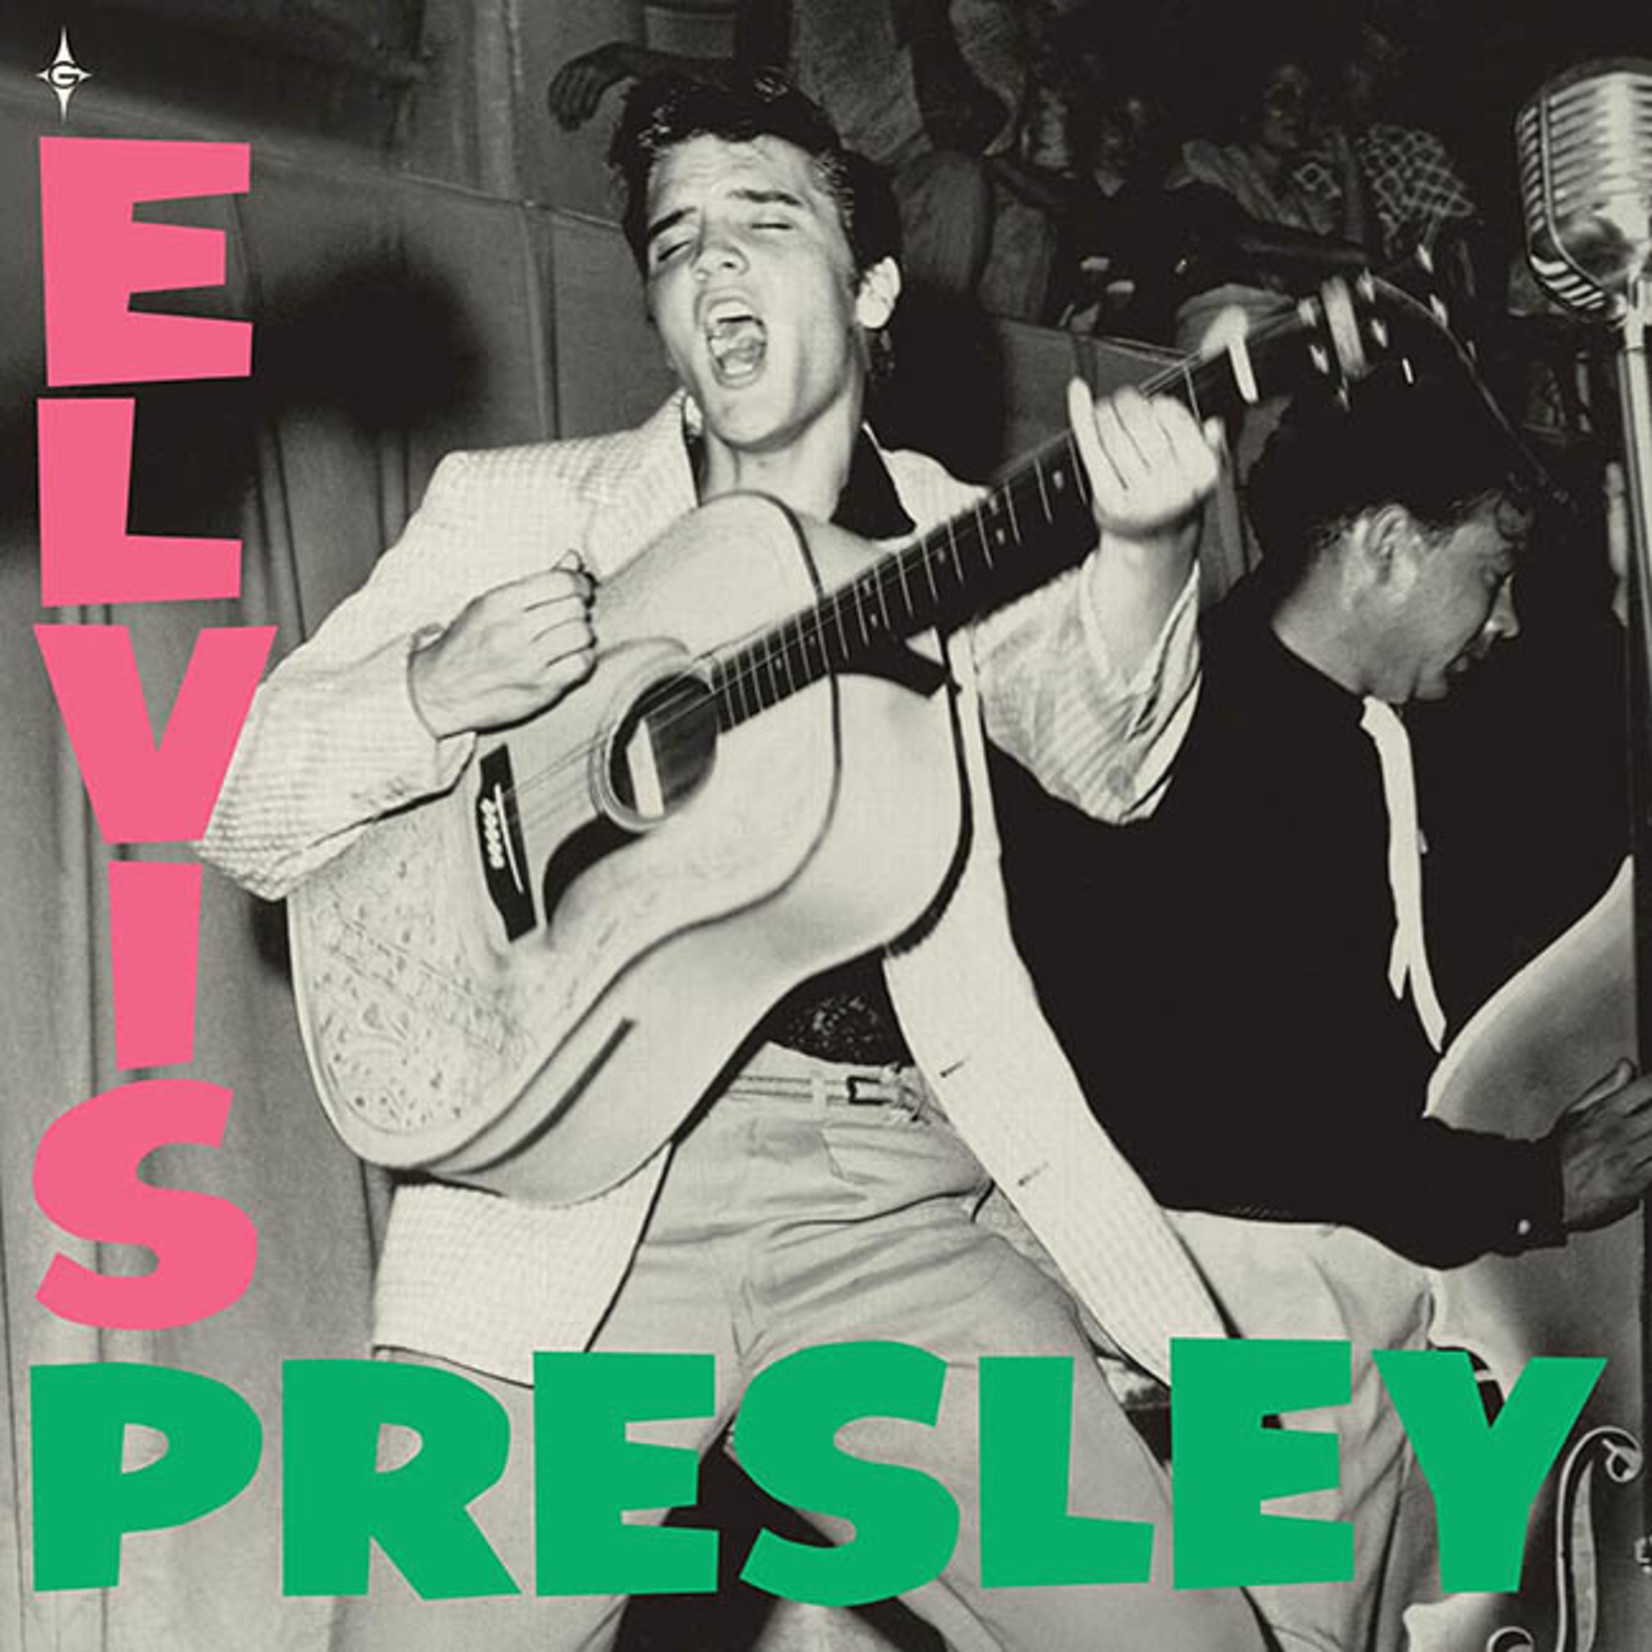 [New] Presley, Elvis: self-titled